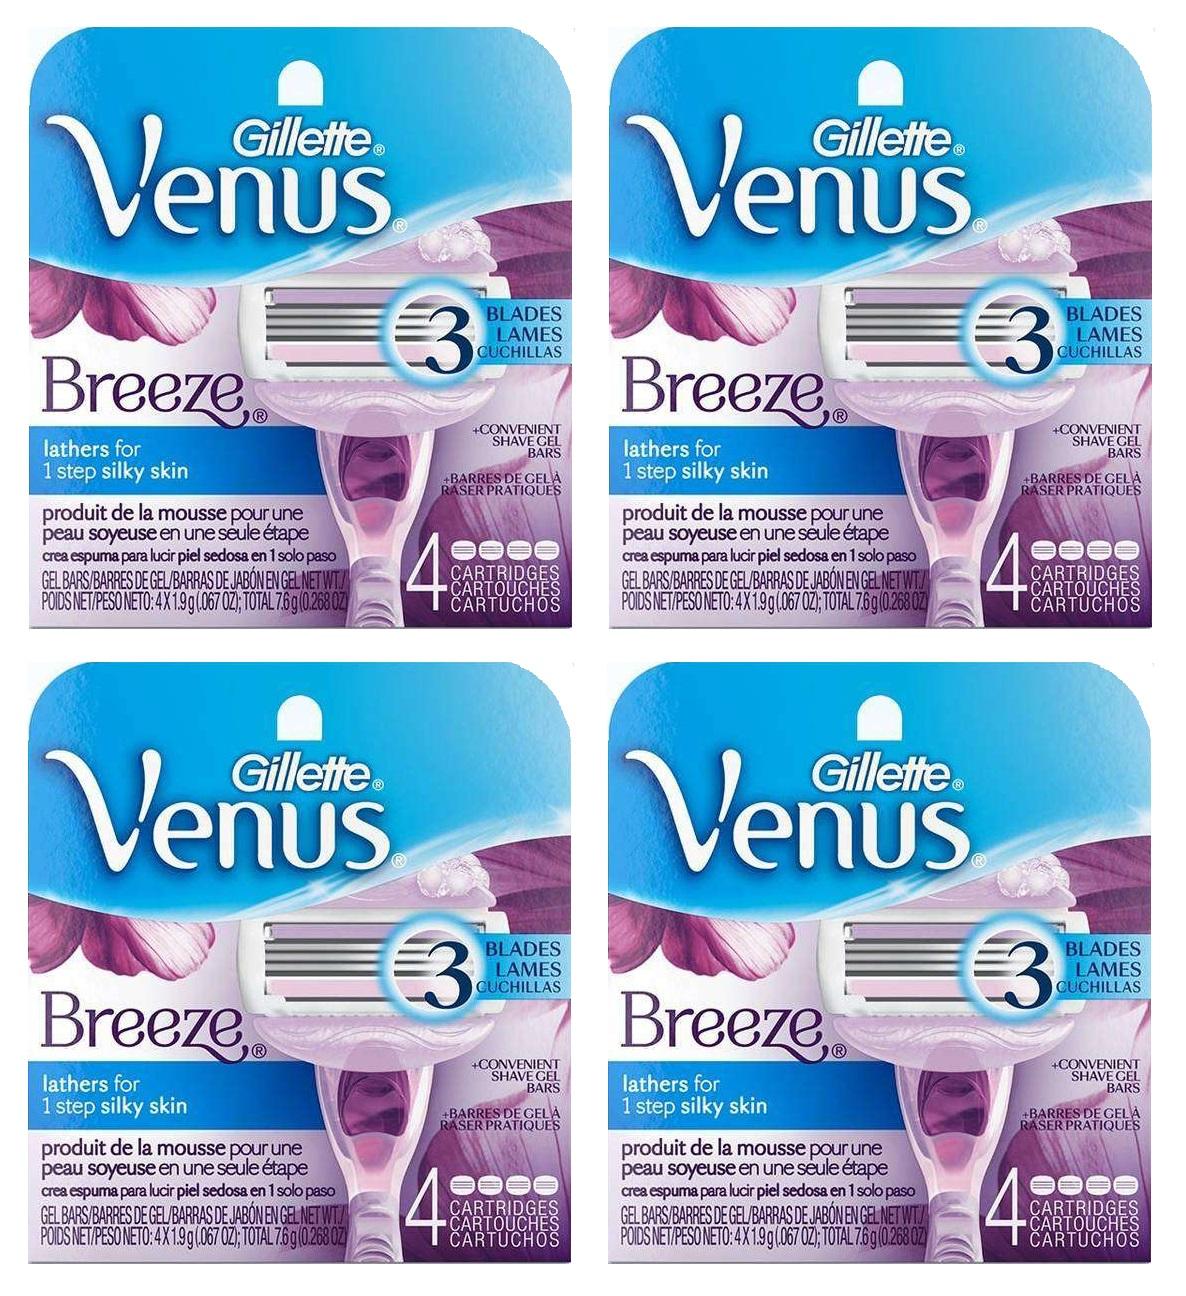 Gillette Venus Breeze Refill Razor Blade Cartridges, 4 Count (Pack of 4)